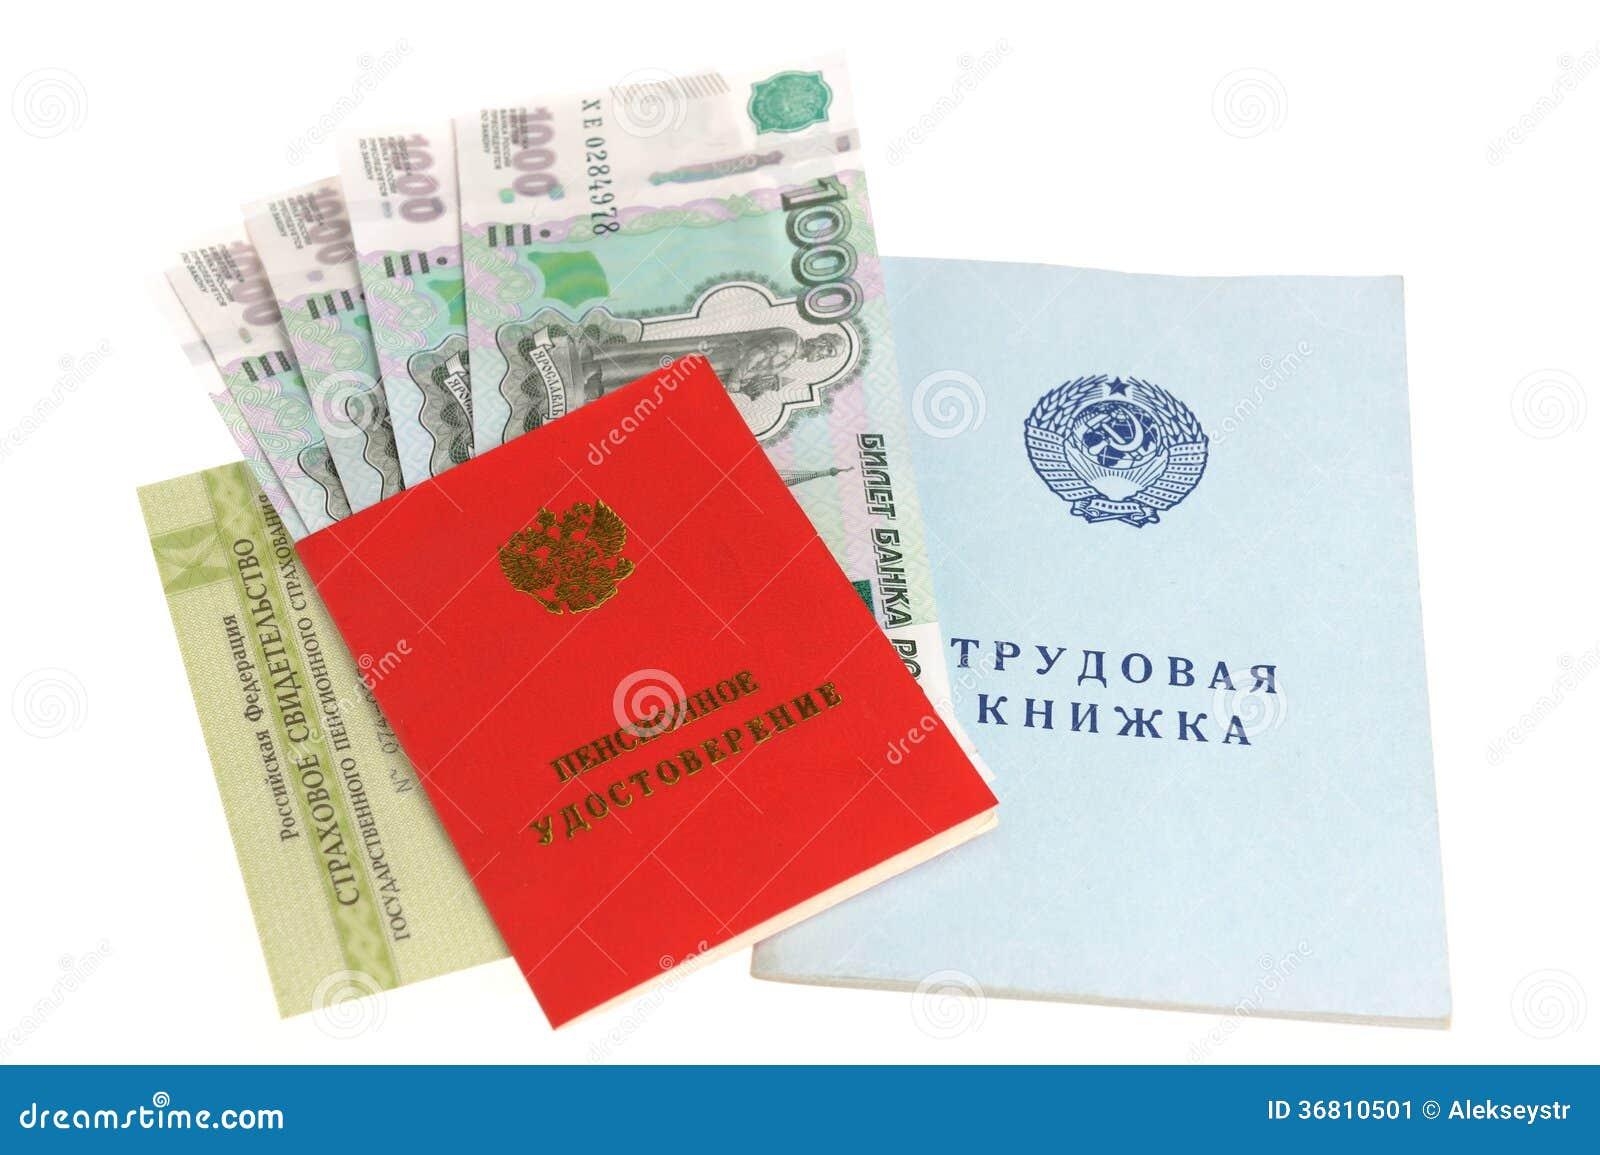 documents pensions calculator xlsm